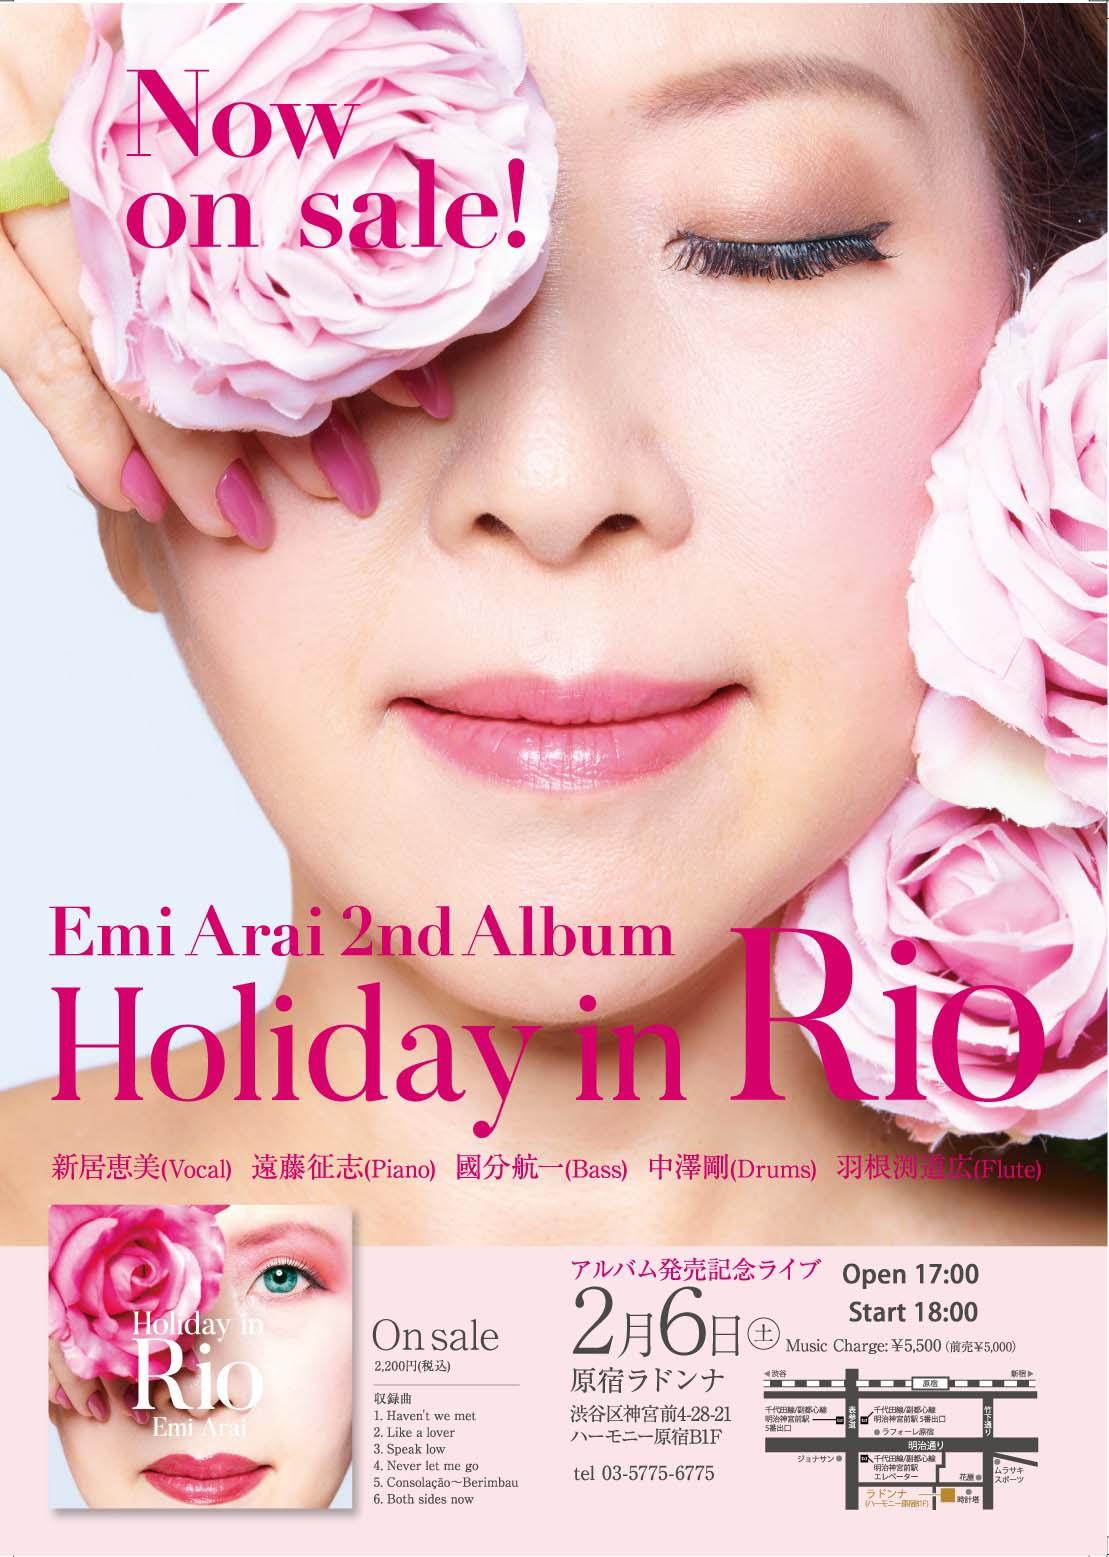 Emi Arai 2nd Album Holoday in Rio アルバム発売記念ライブ